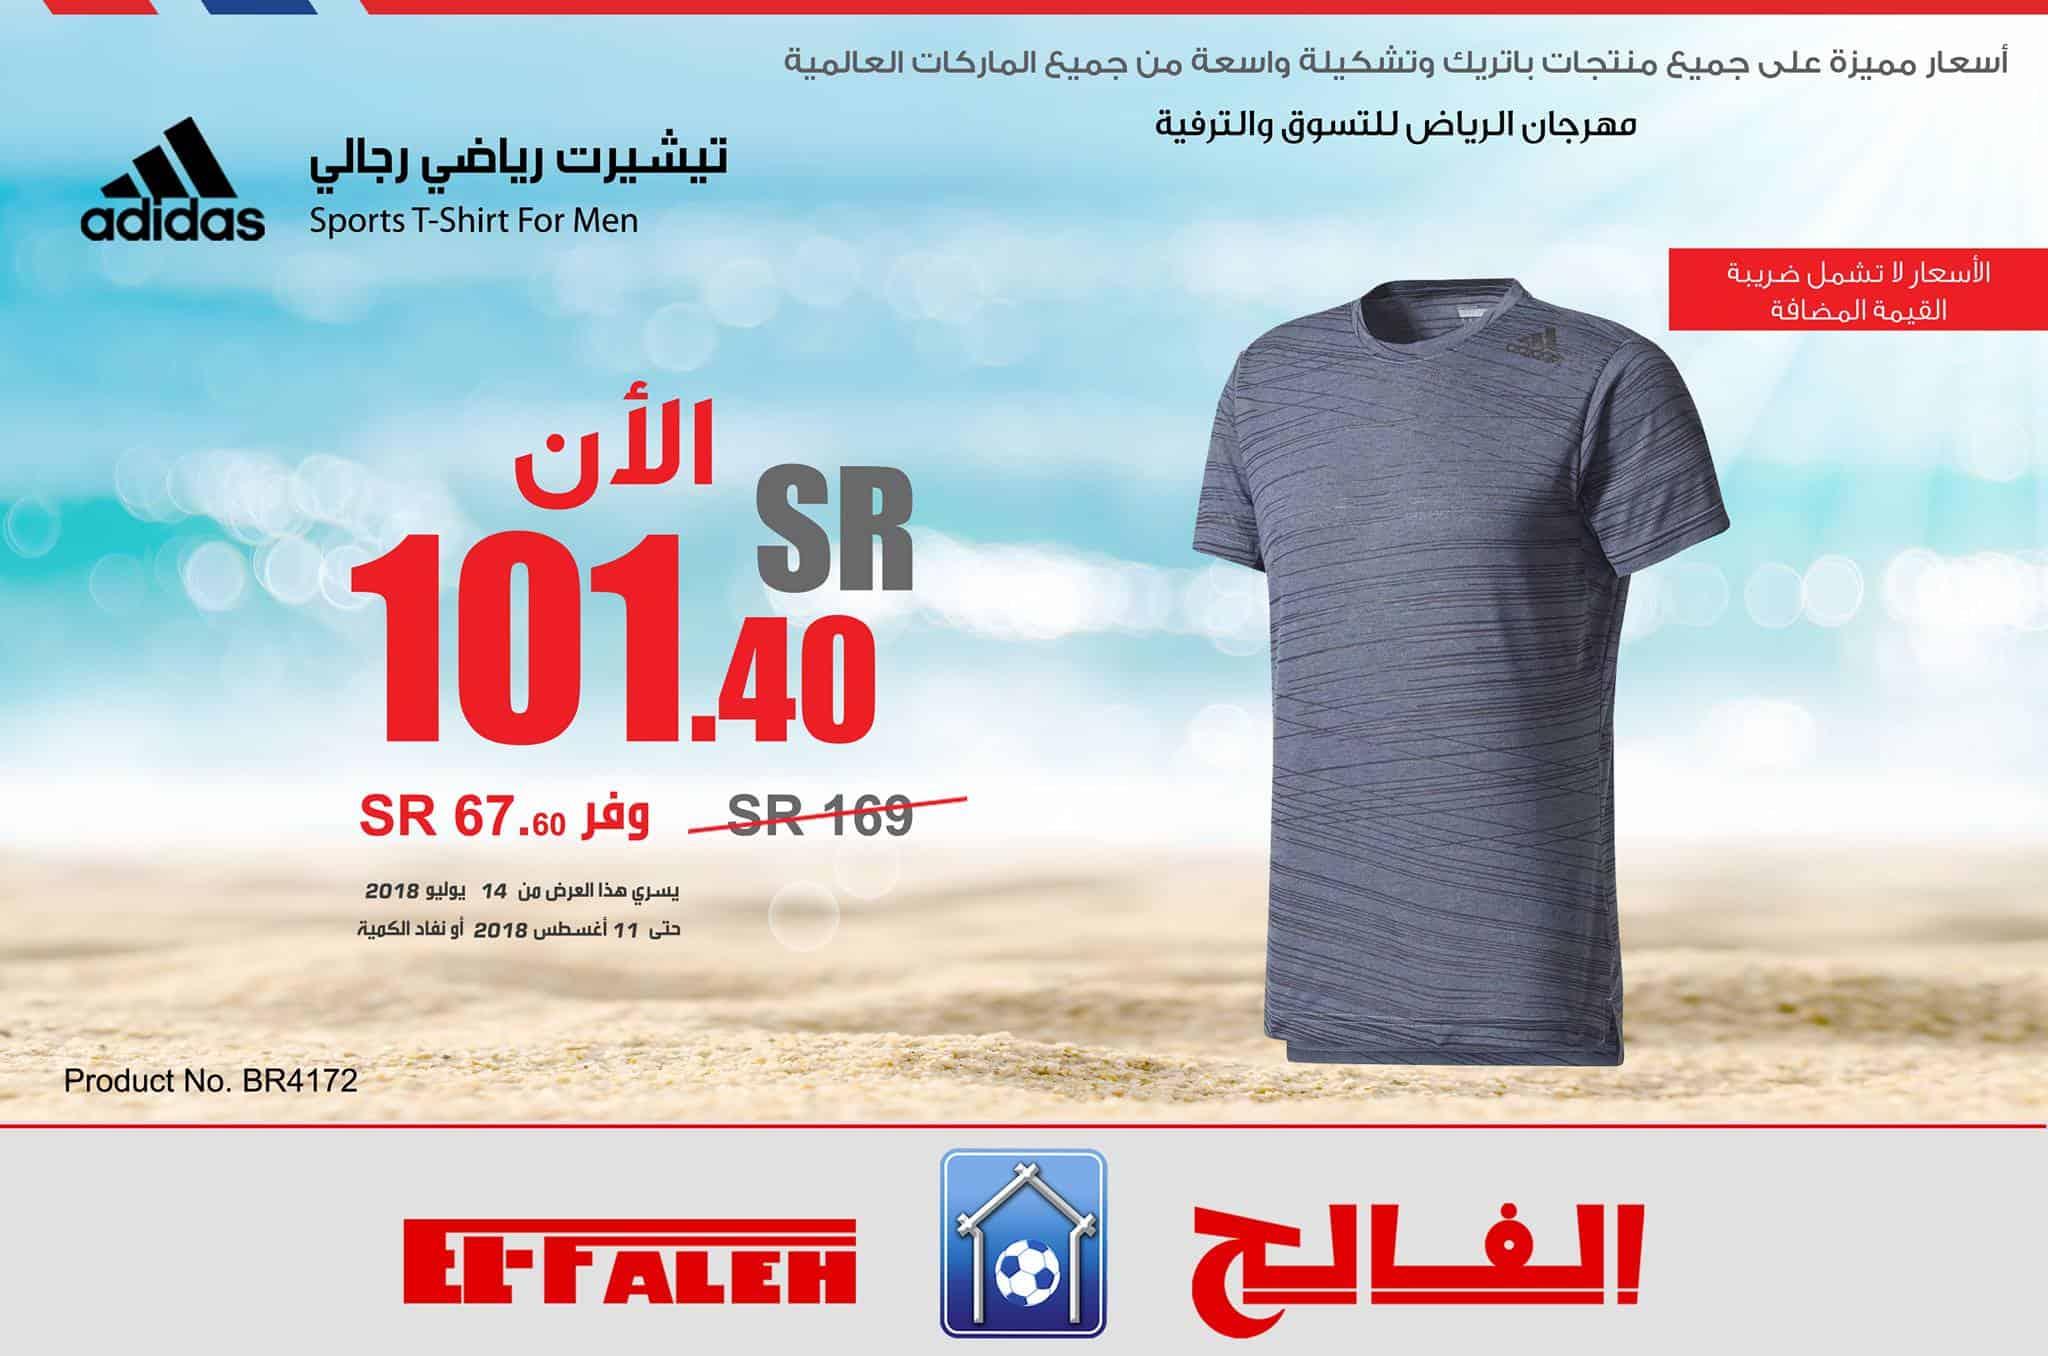 ef1cac769 عروض الفالح لشهر رمضان باسعار خاصة ومميزة للجميع عروض رمضان ...